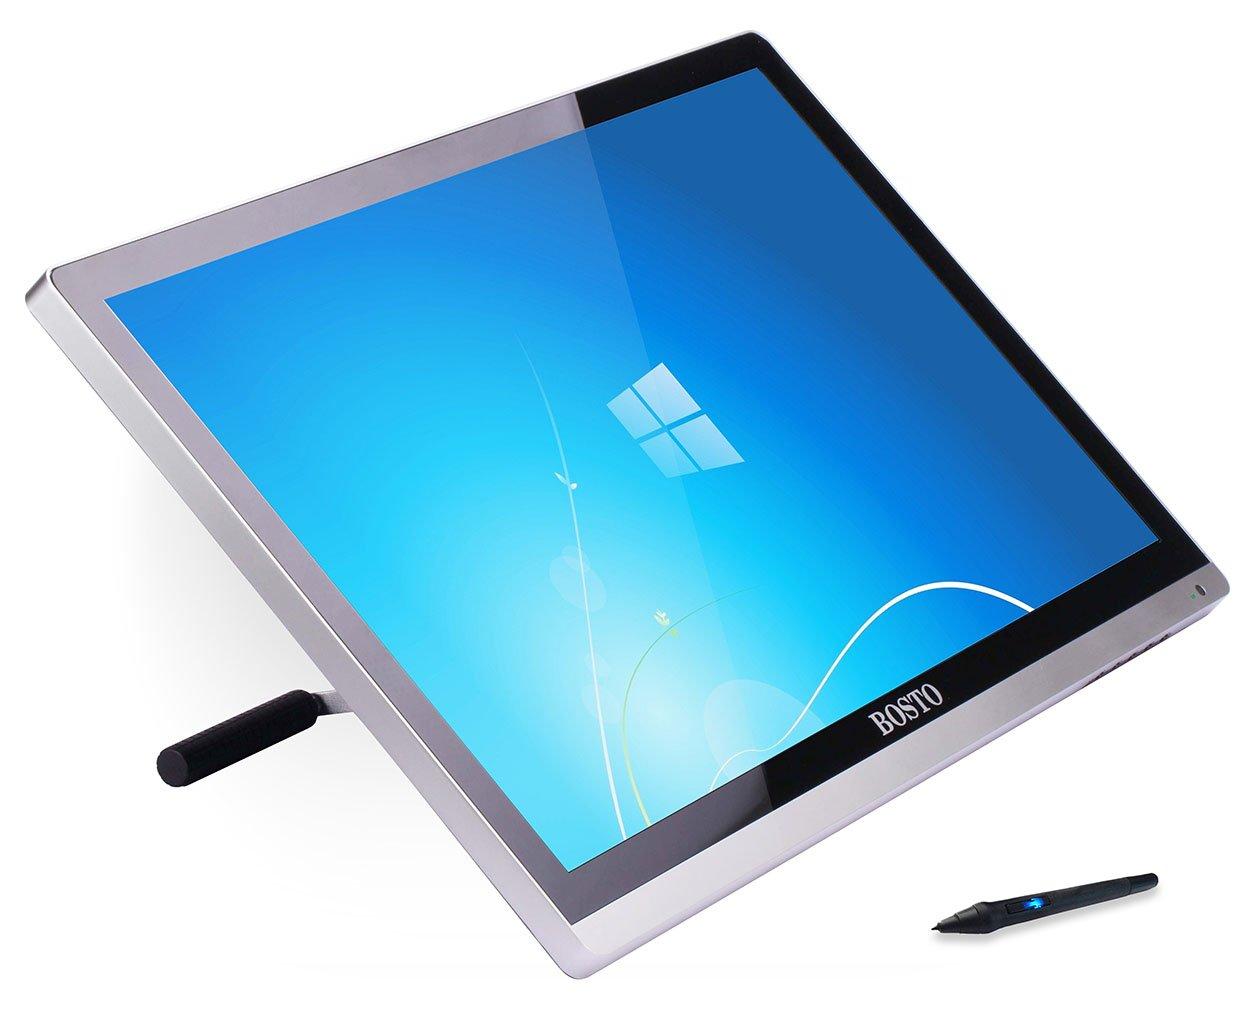 Bosto Kingtee 22U Mini Pen Display Tablet (Hardware) Review 2